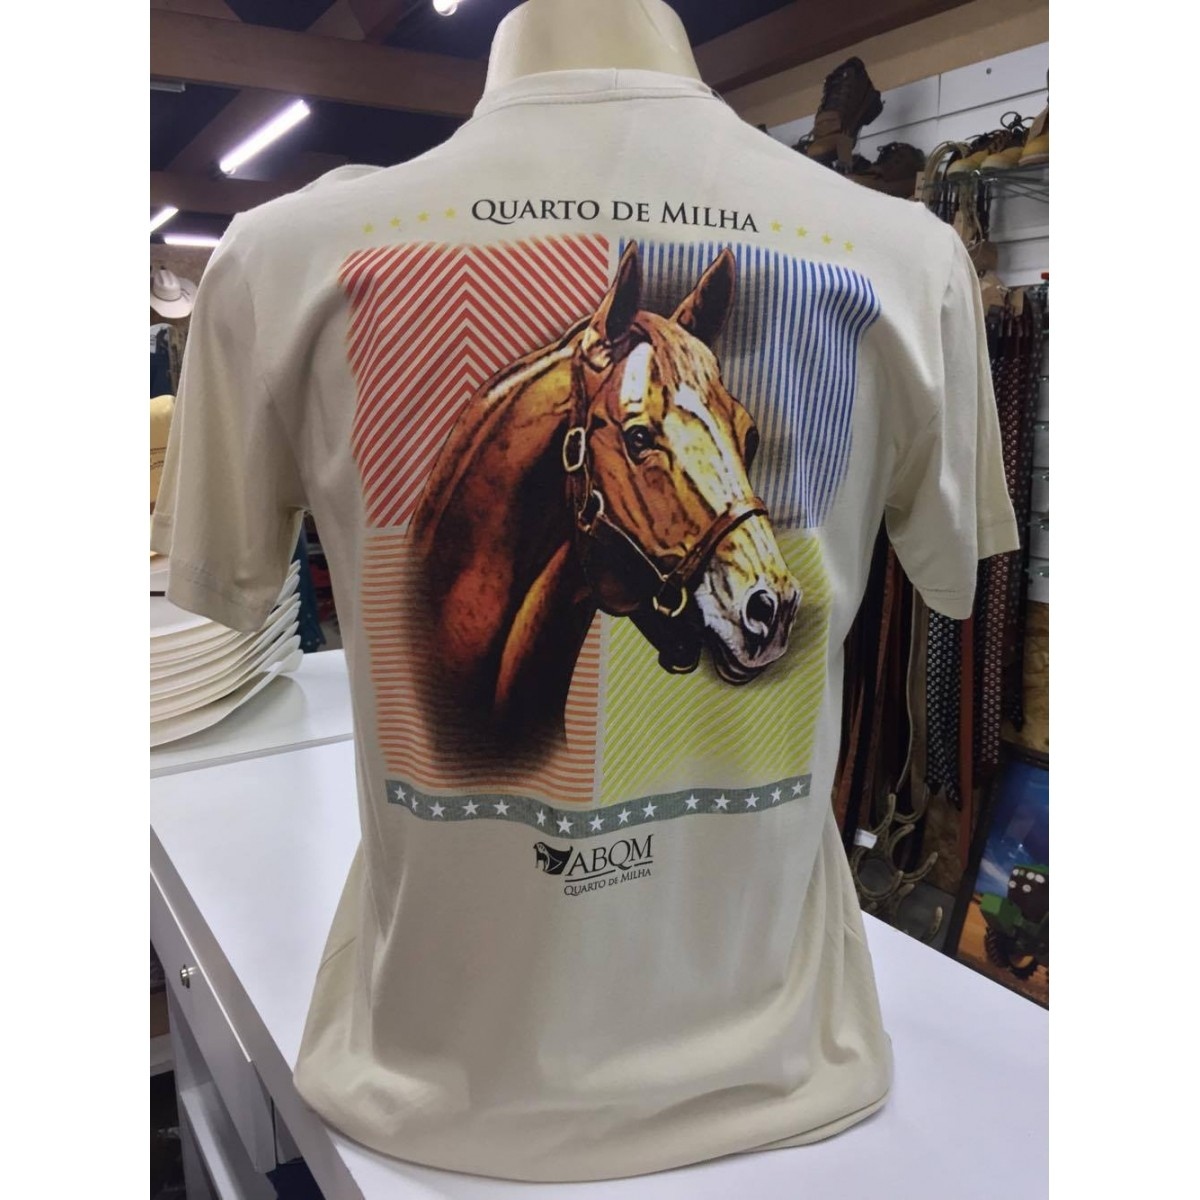 camiseta ABQM tamanho M 001 - Selaria Zamboim 9e9a6499d4b